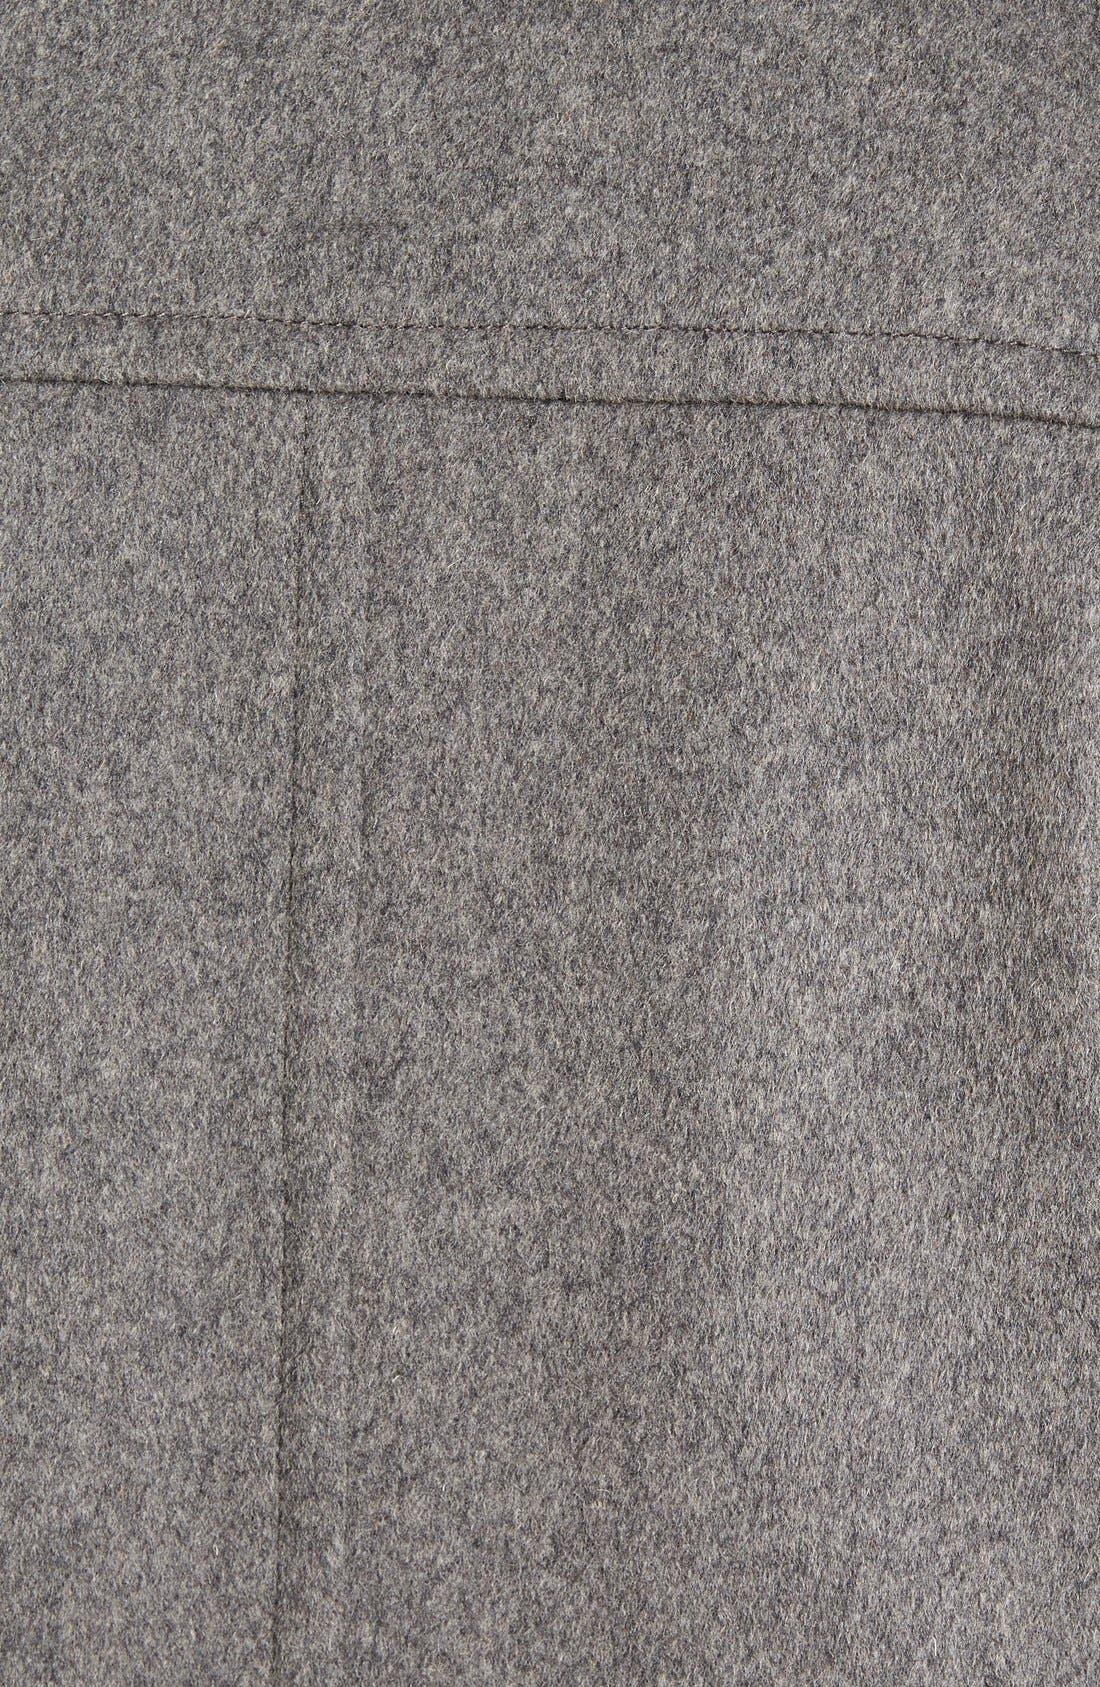 Douglas Modern Fit Wool & Cashmere Overcoat,                             Alternate thumbnail 14, color,